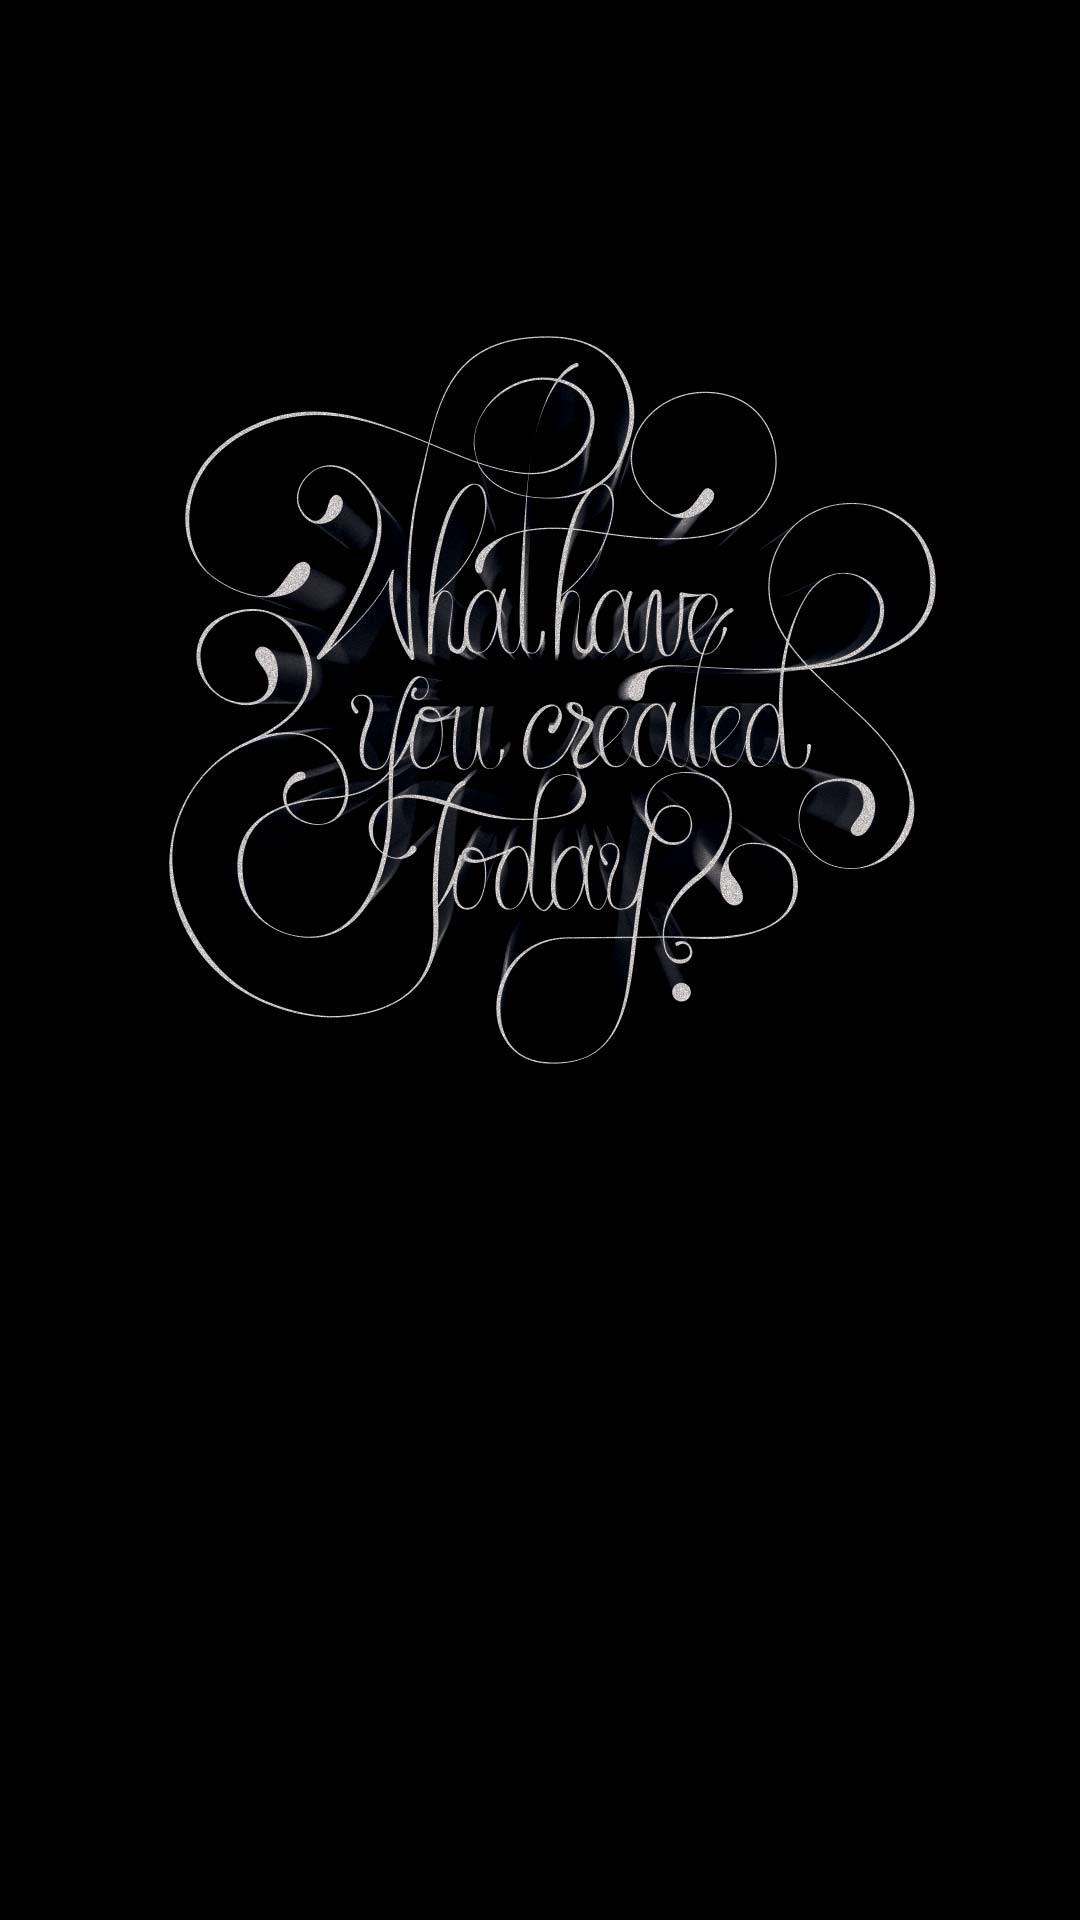 typography-iphone-7-plus-wallpaper